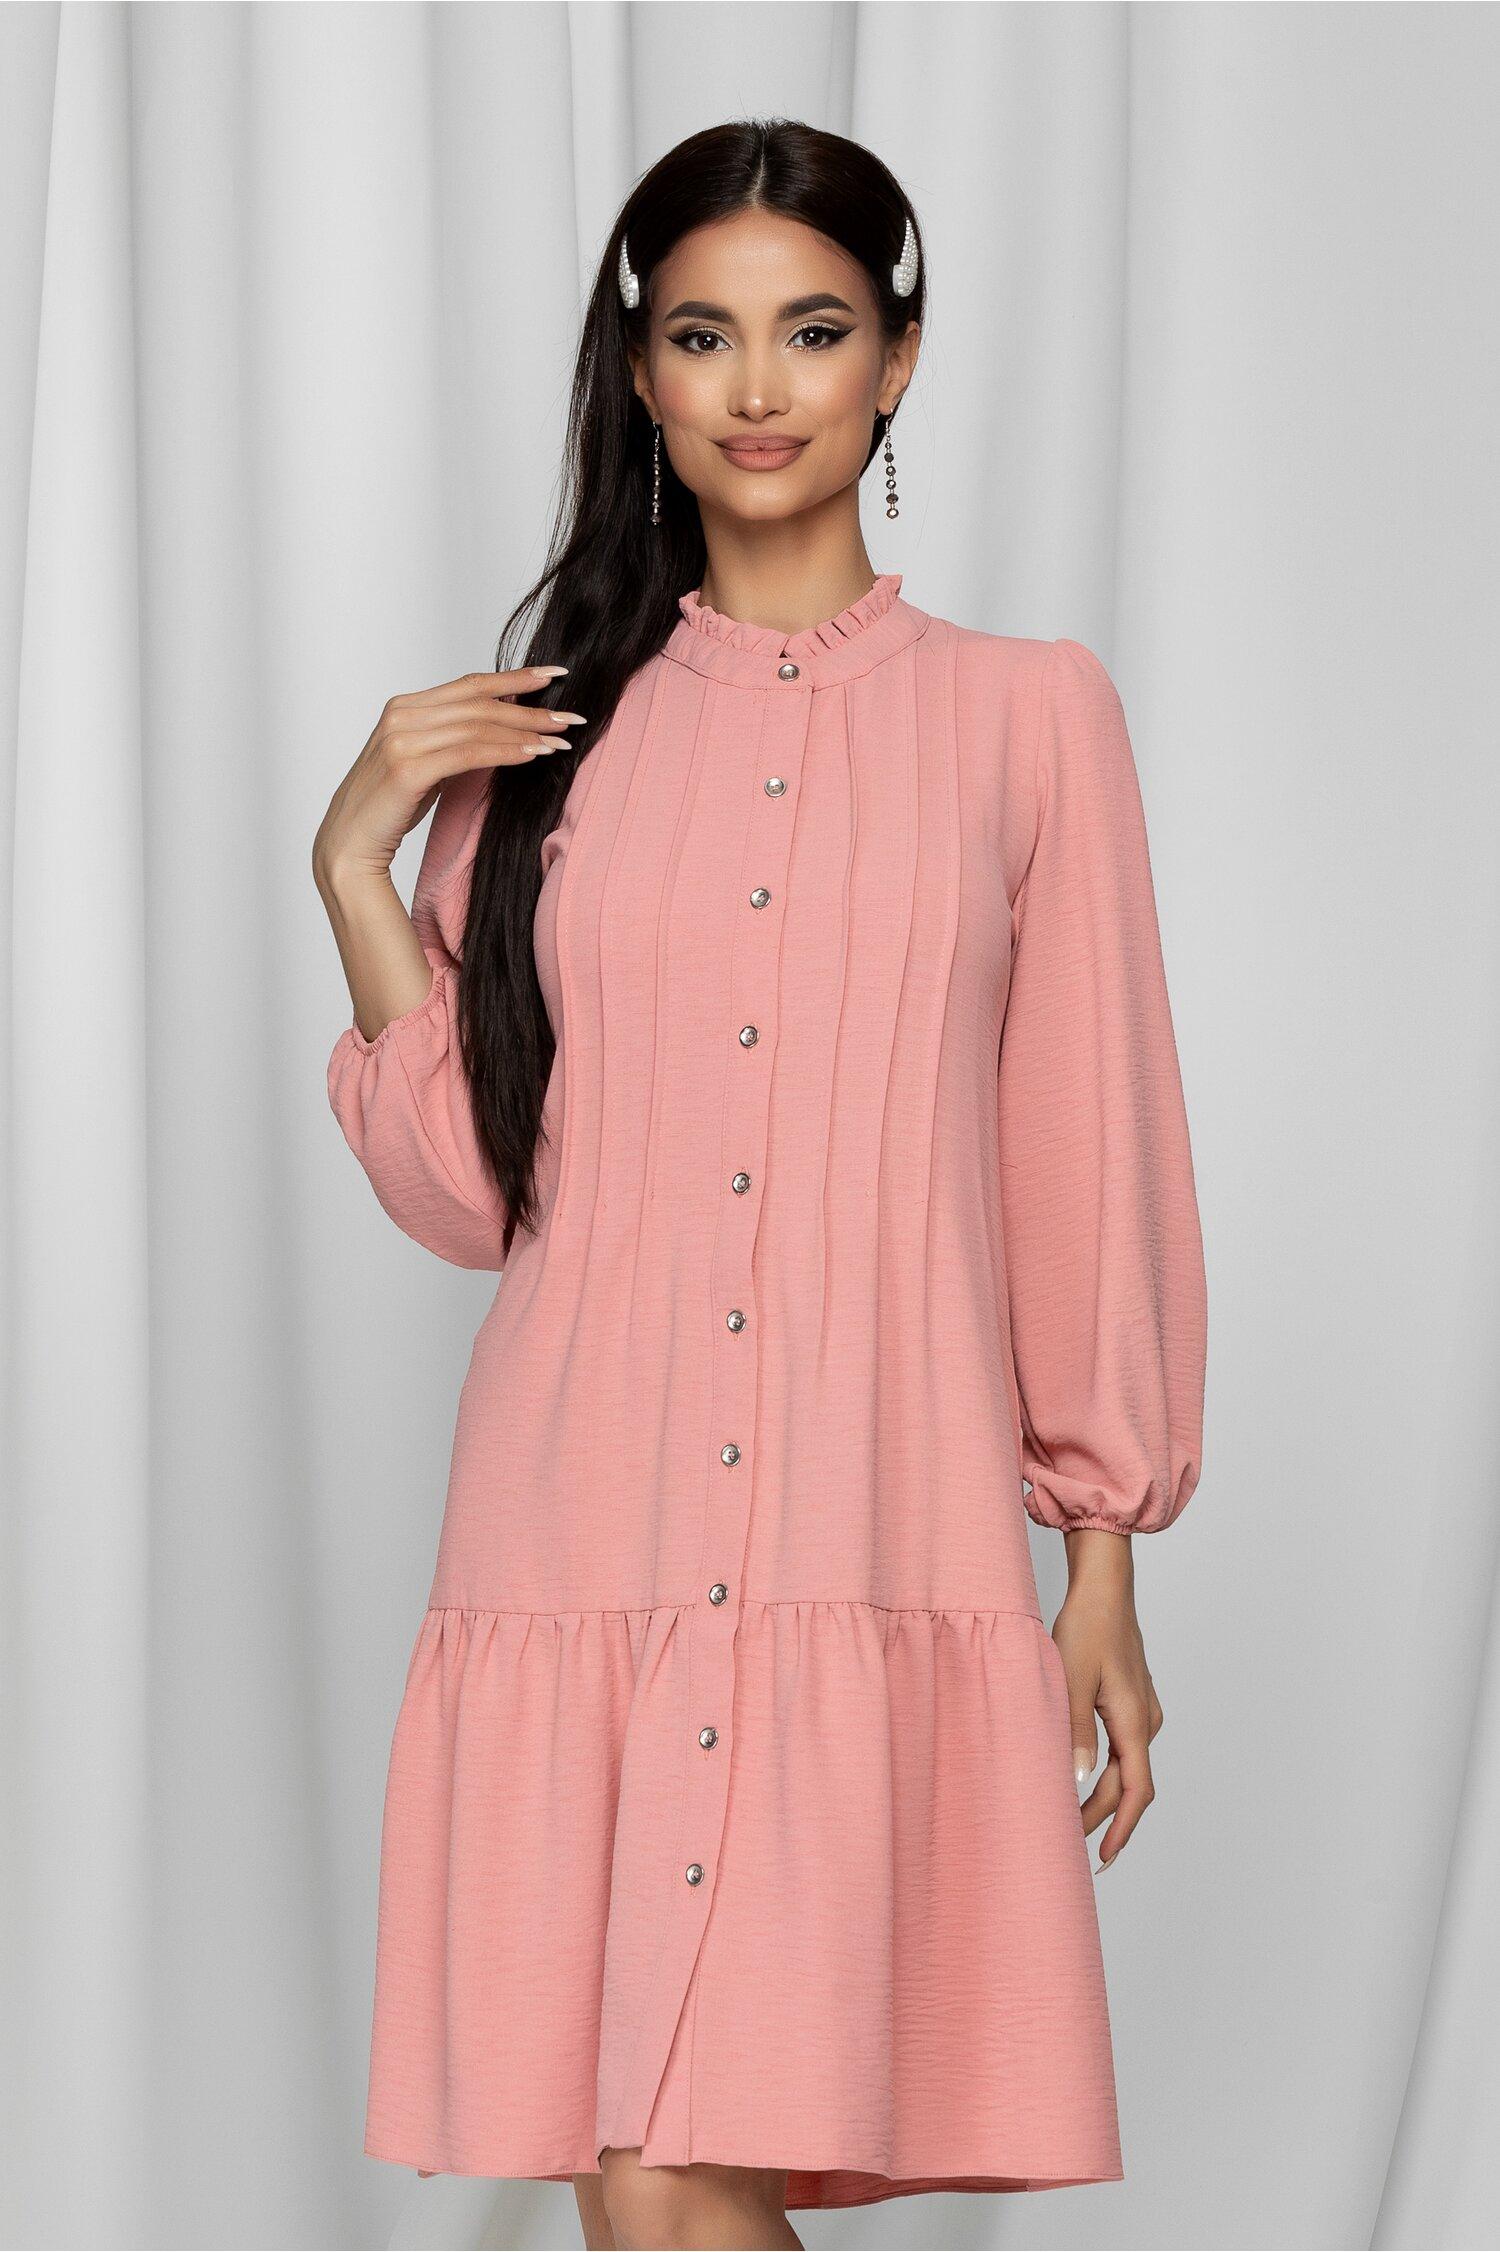 Rochie Samira roz tip camasa cu pliuri la bust